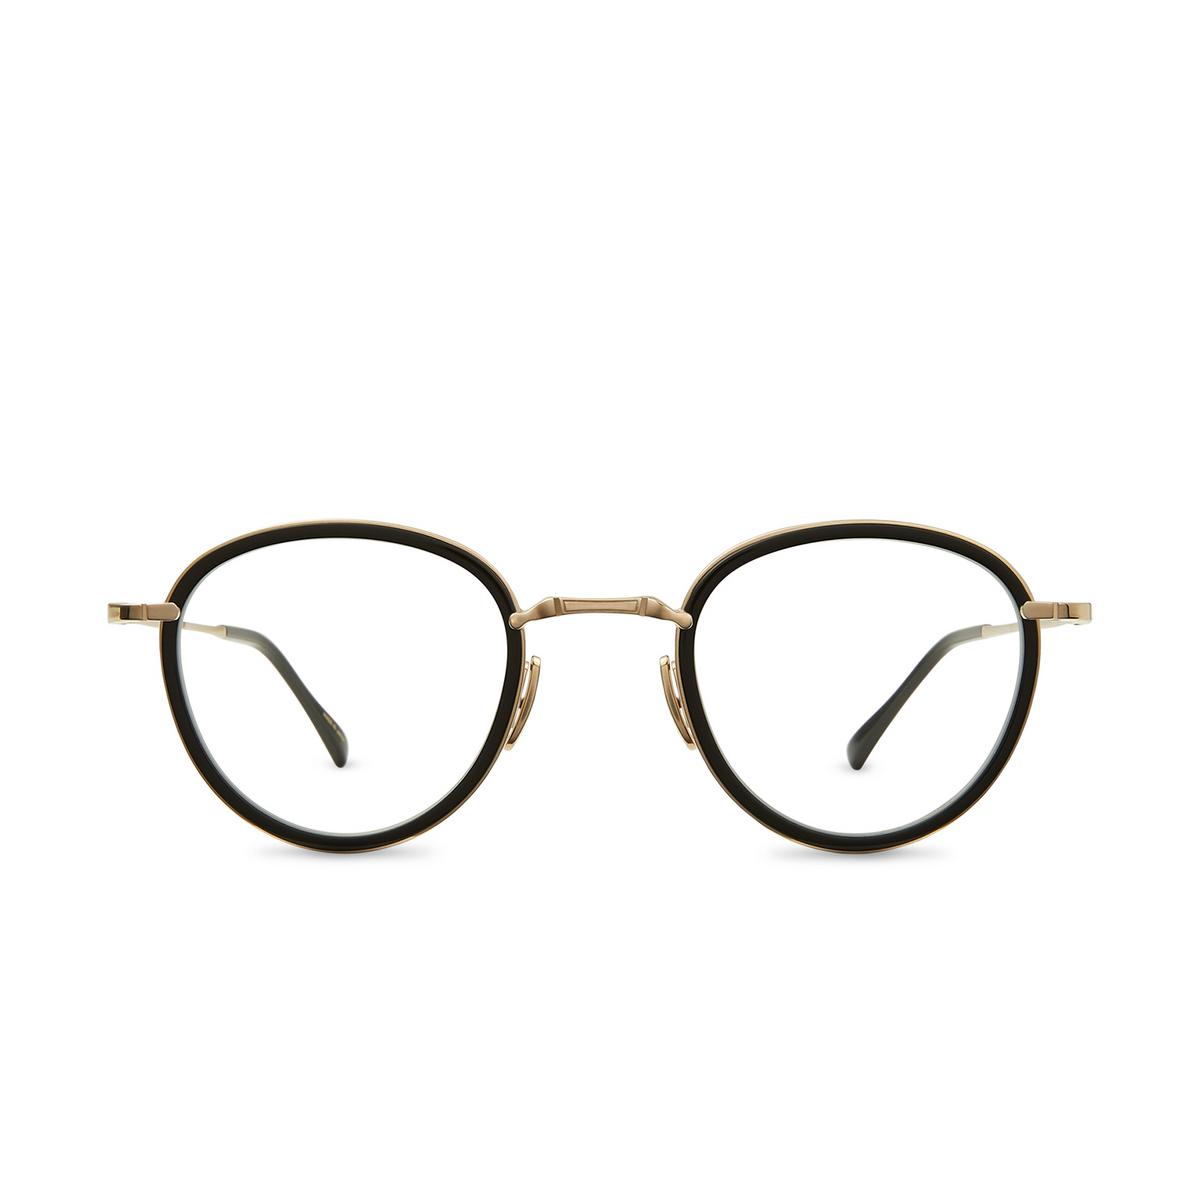 Mr. Leight® Round Eyeglasses: Mulholland C color BK-12KWG-BK - front view.